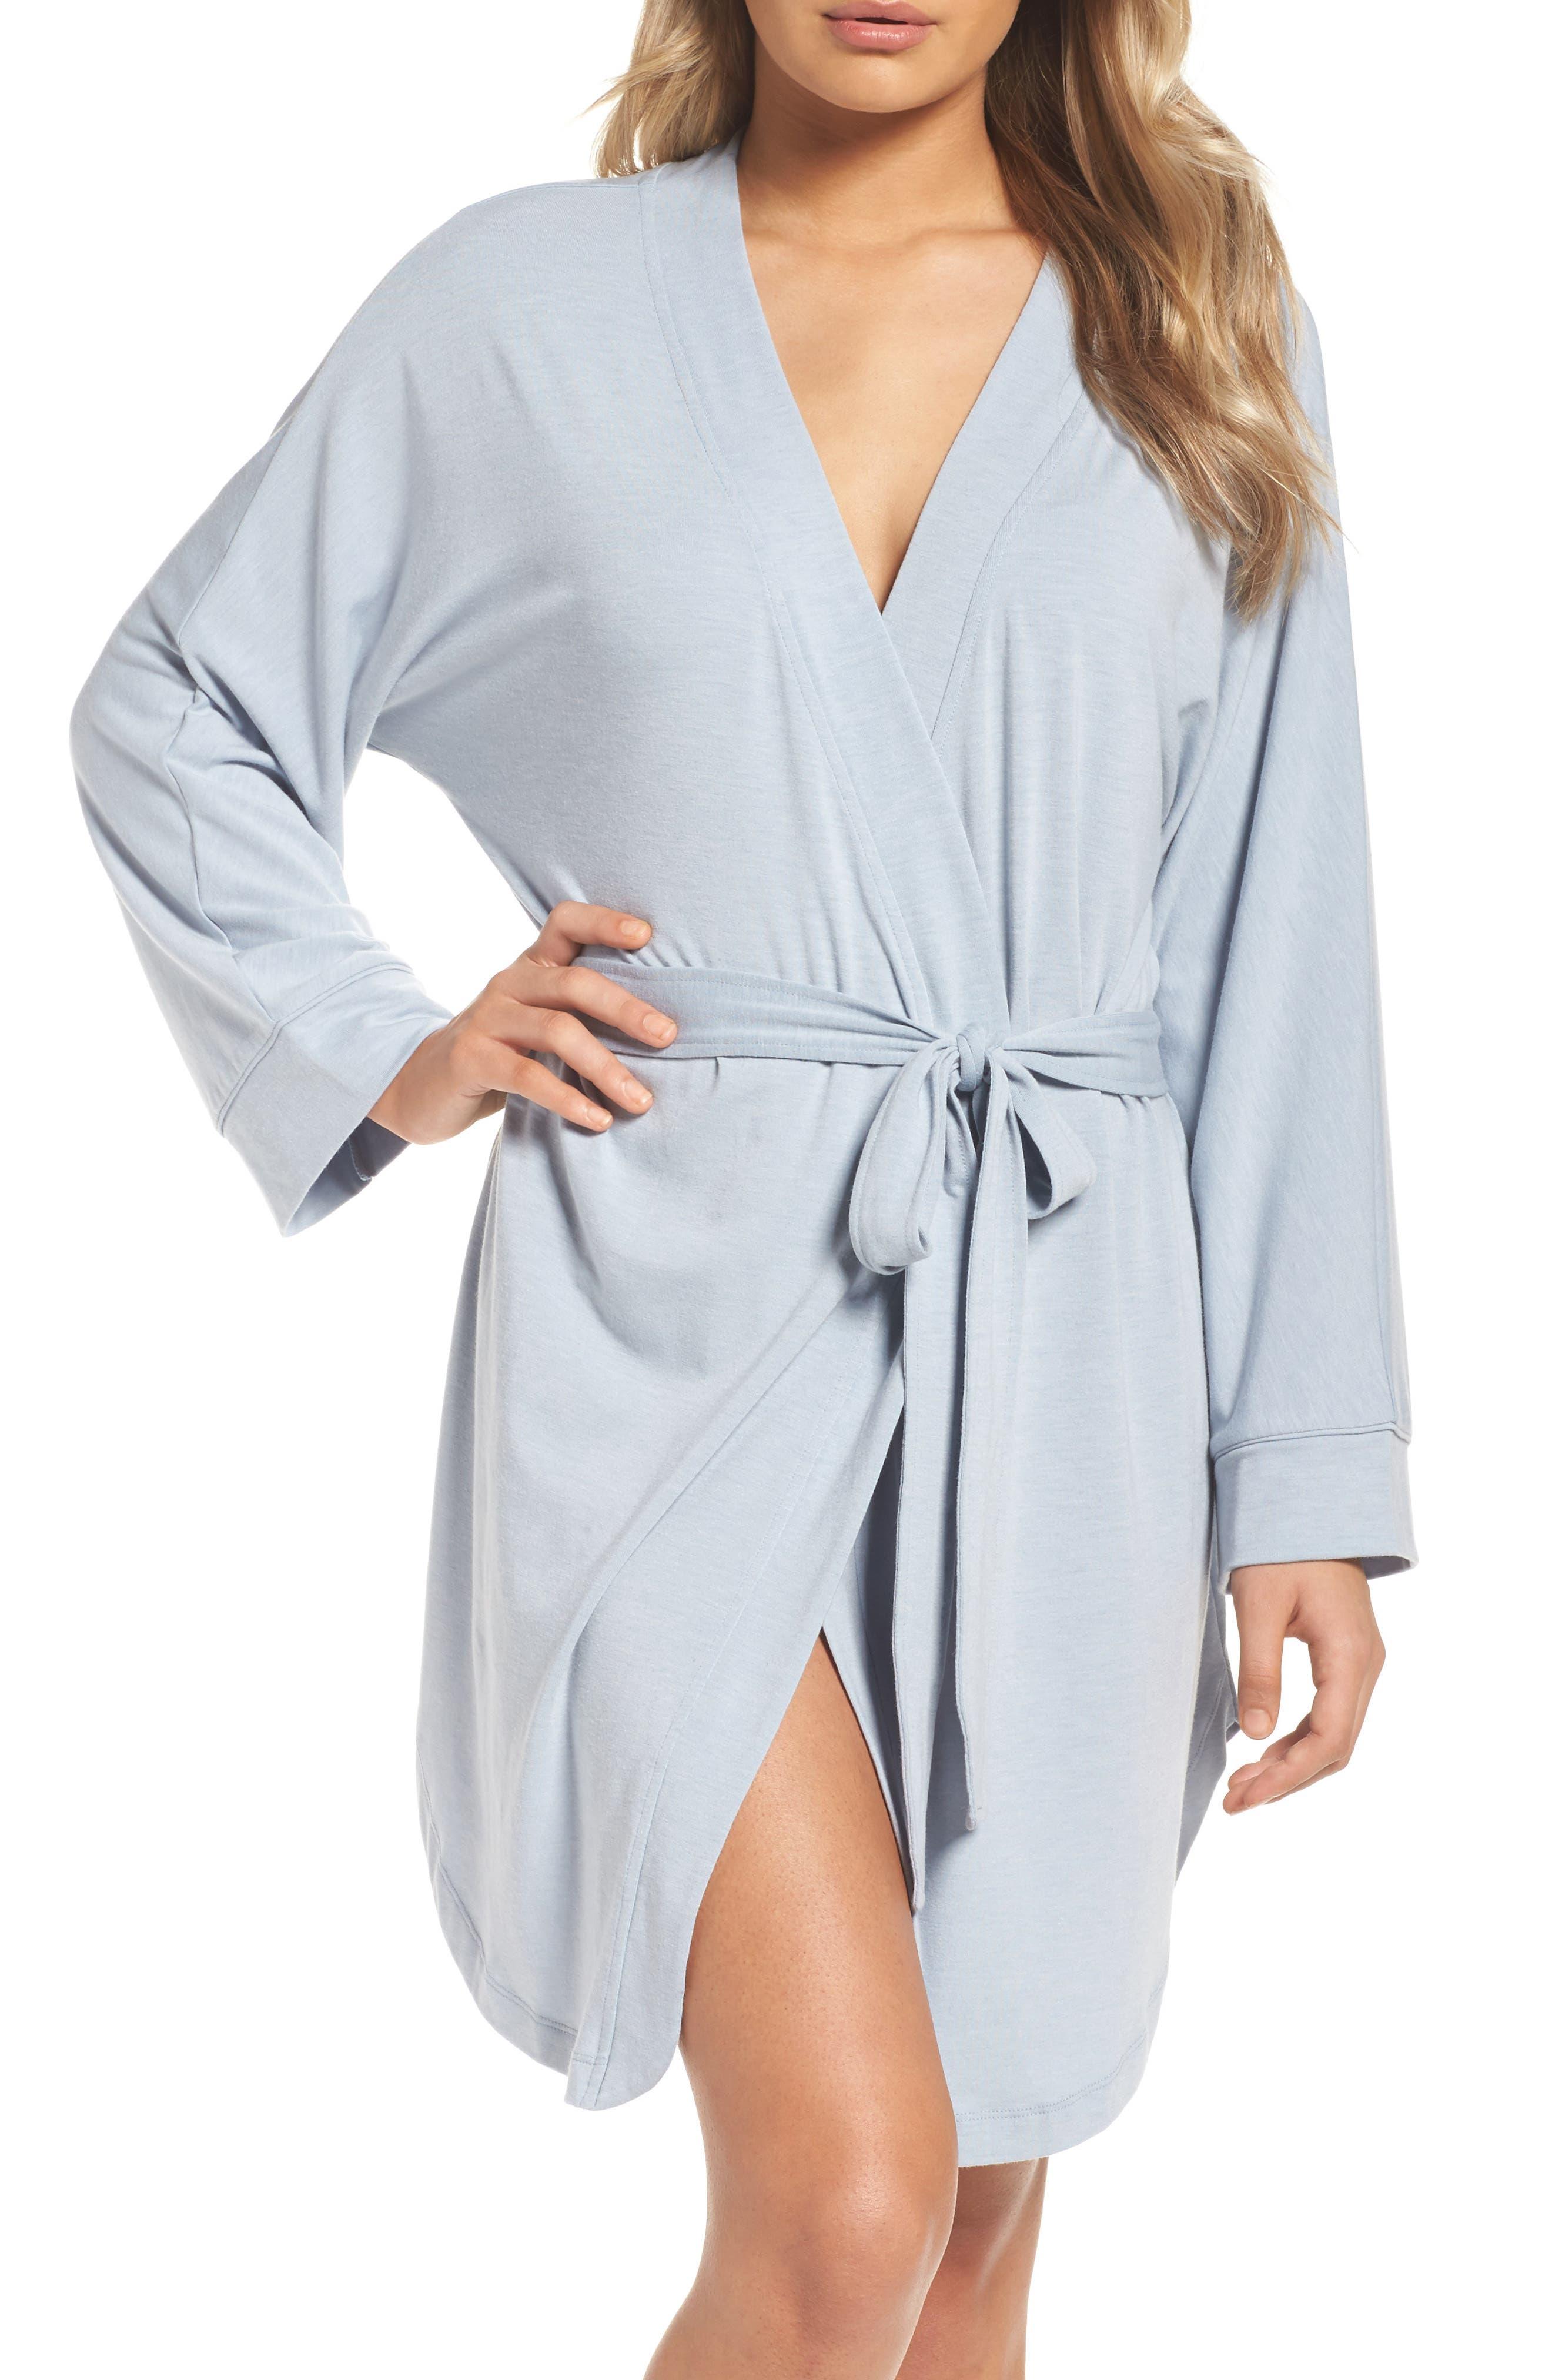 HONEYDEW INTIMATES Jersey Robe